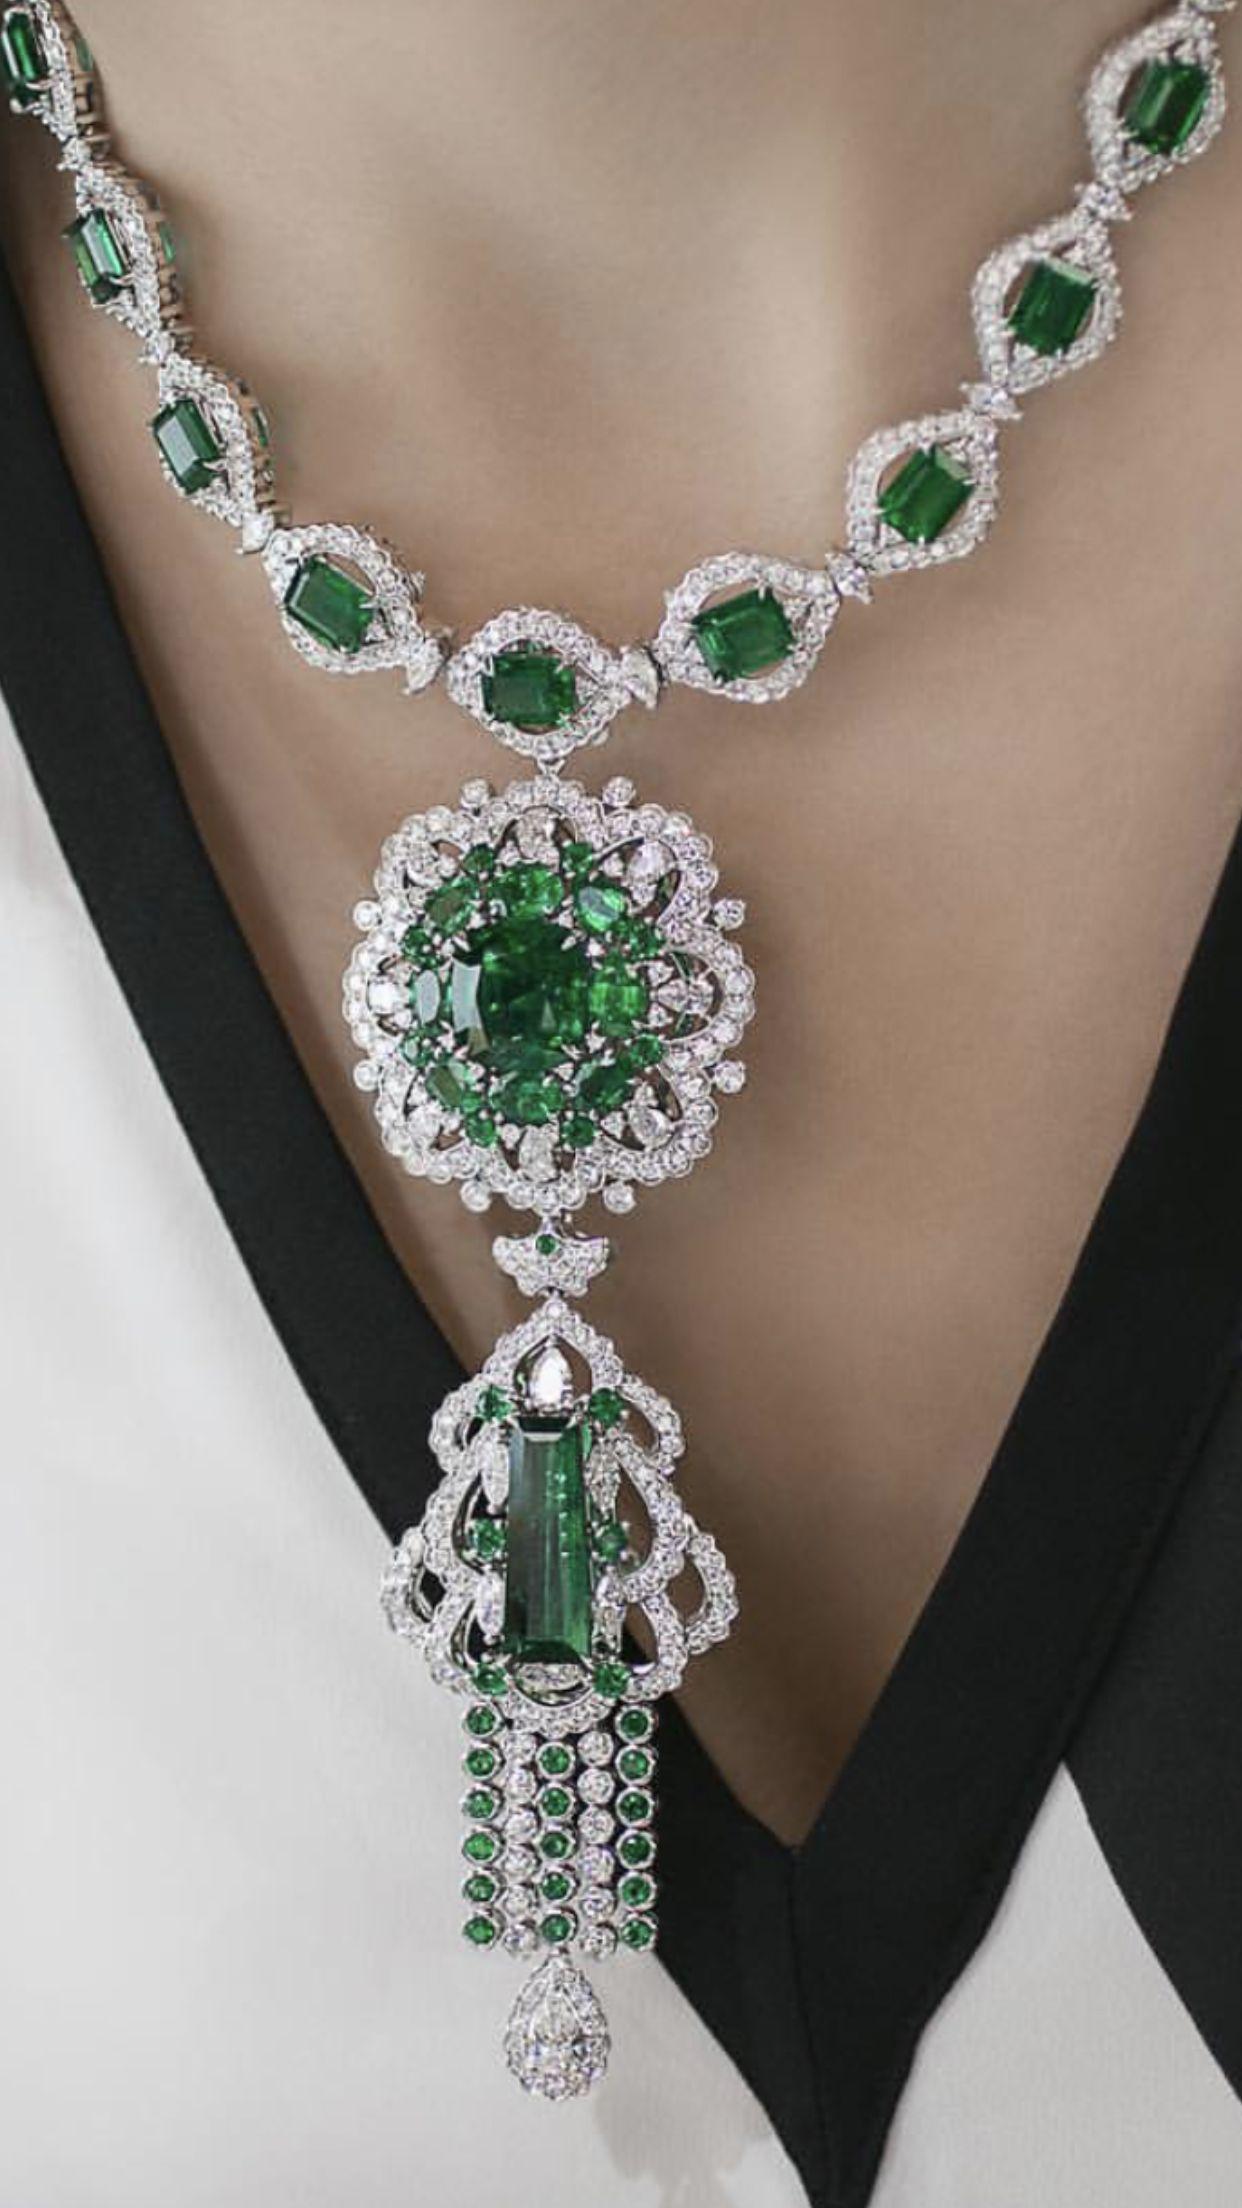 7e4cd080177c8 Pin by Hana on Jewllery in 2019   Jewelry, Gems jewelry, Emerald jewelry